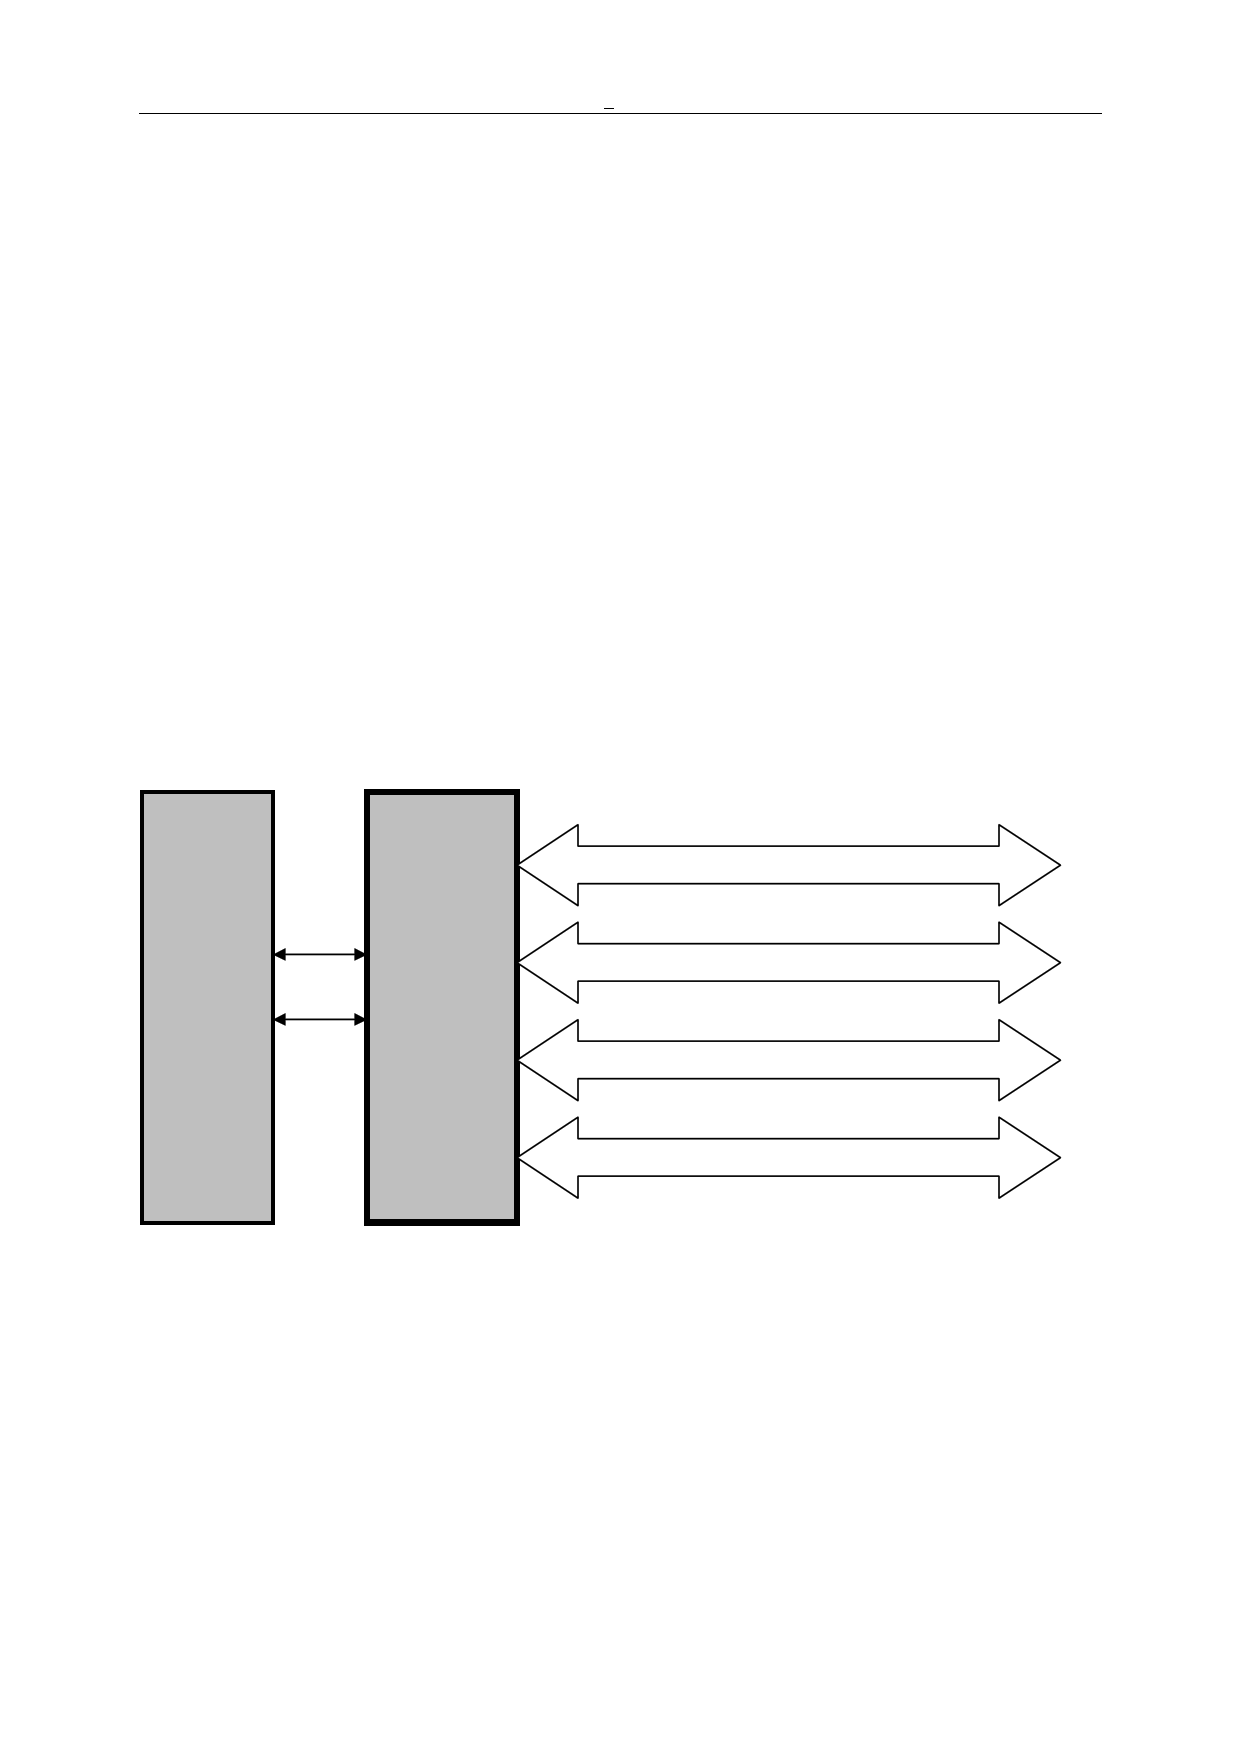 CH341A image